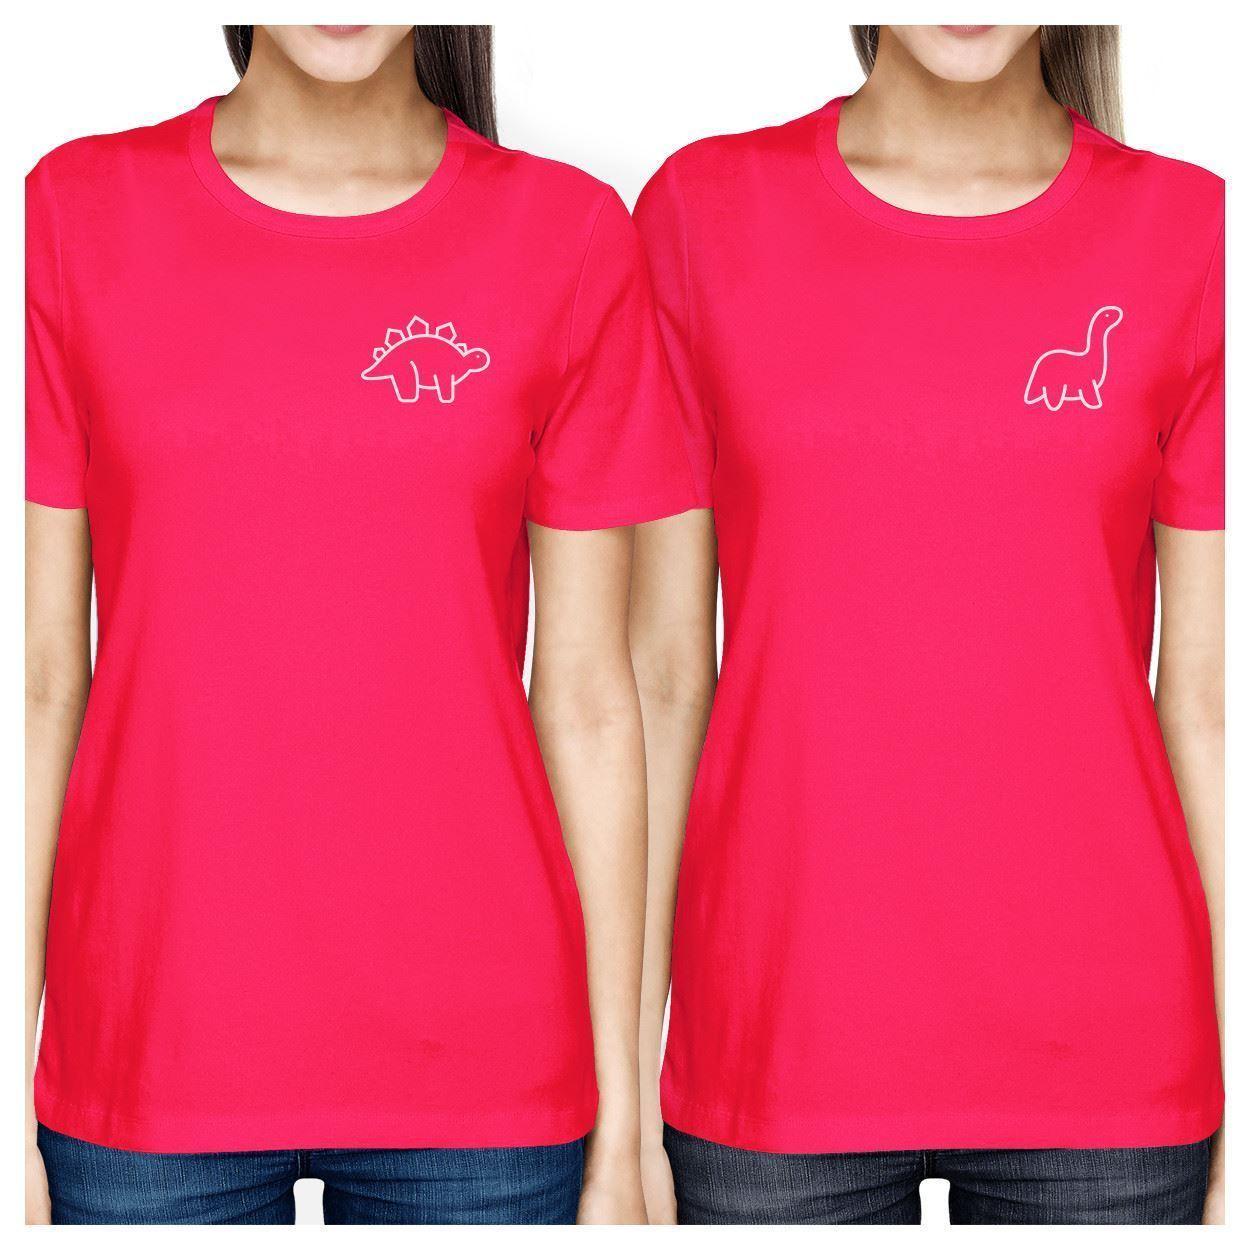 Dinosaurs BFF Matching Hot Pink Shirts - $30.99 - $32.99